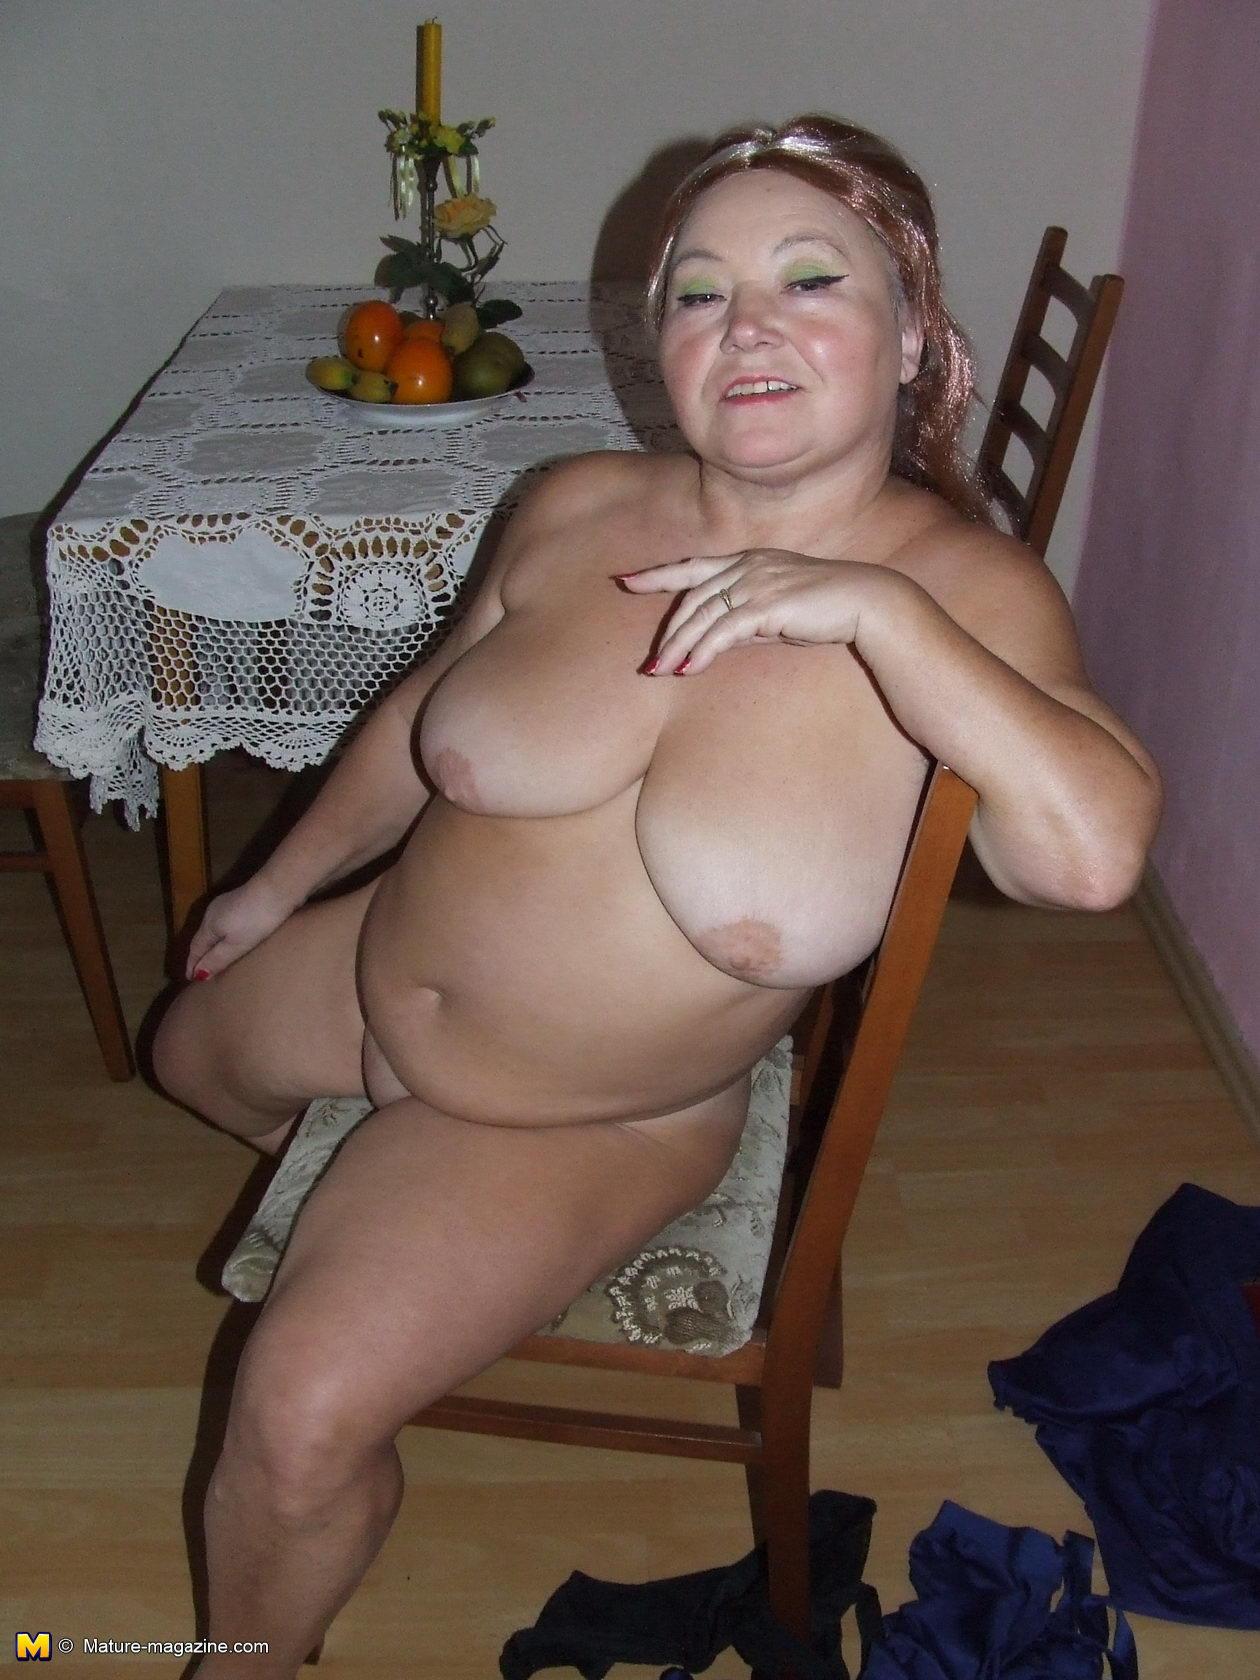 Lebnan Girls Curvy Mature Nude Women Pissing